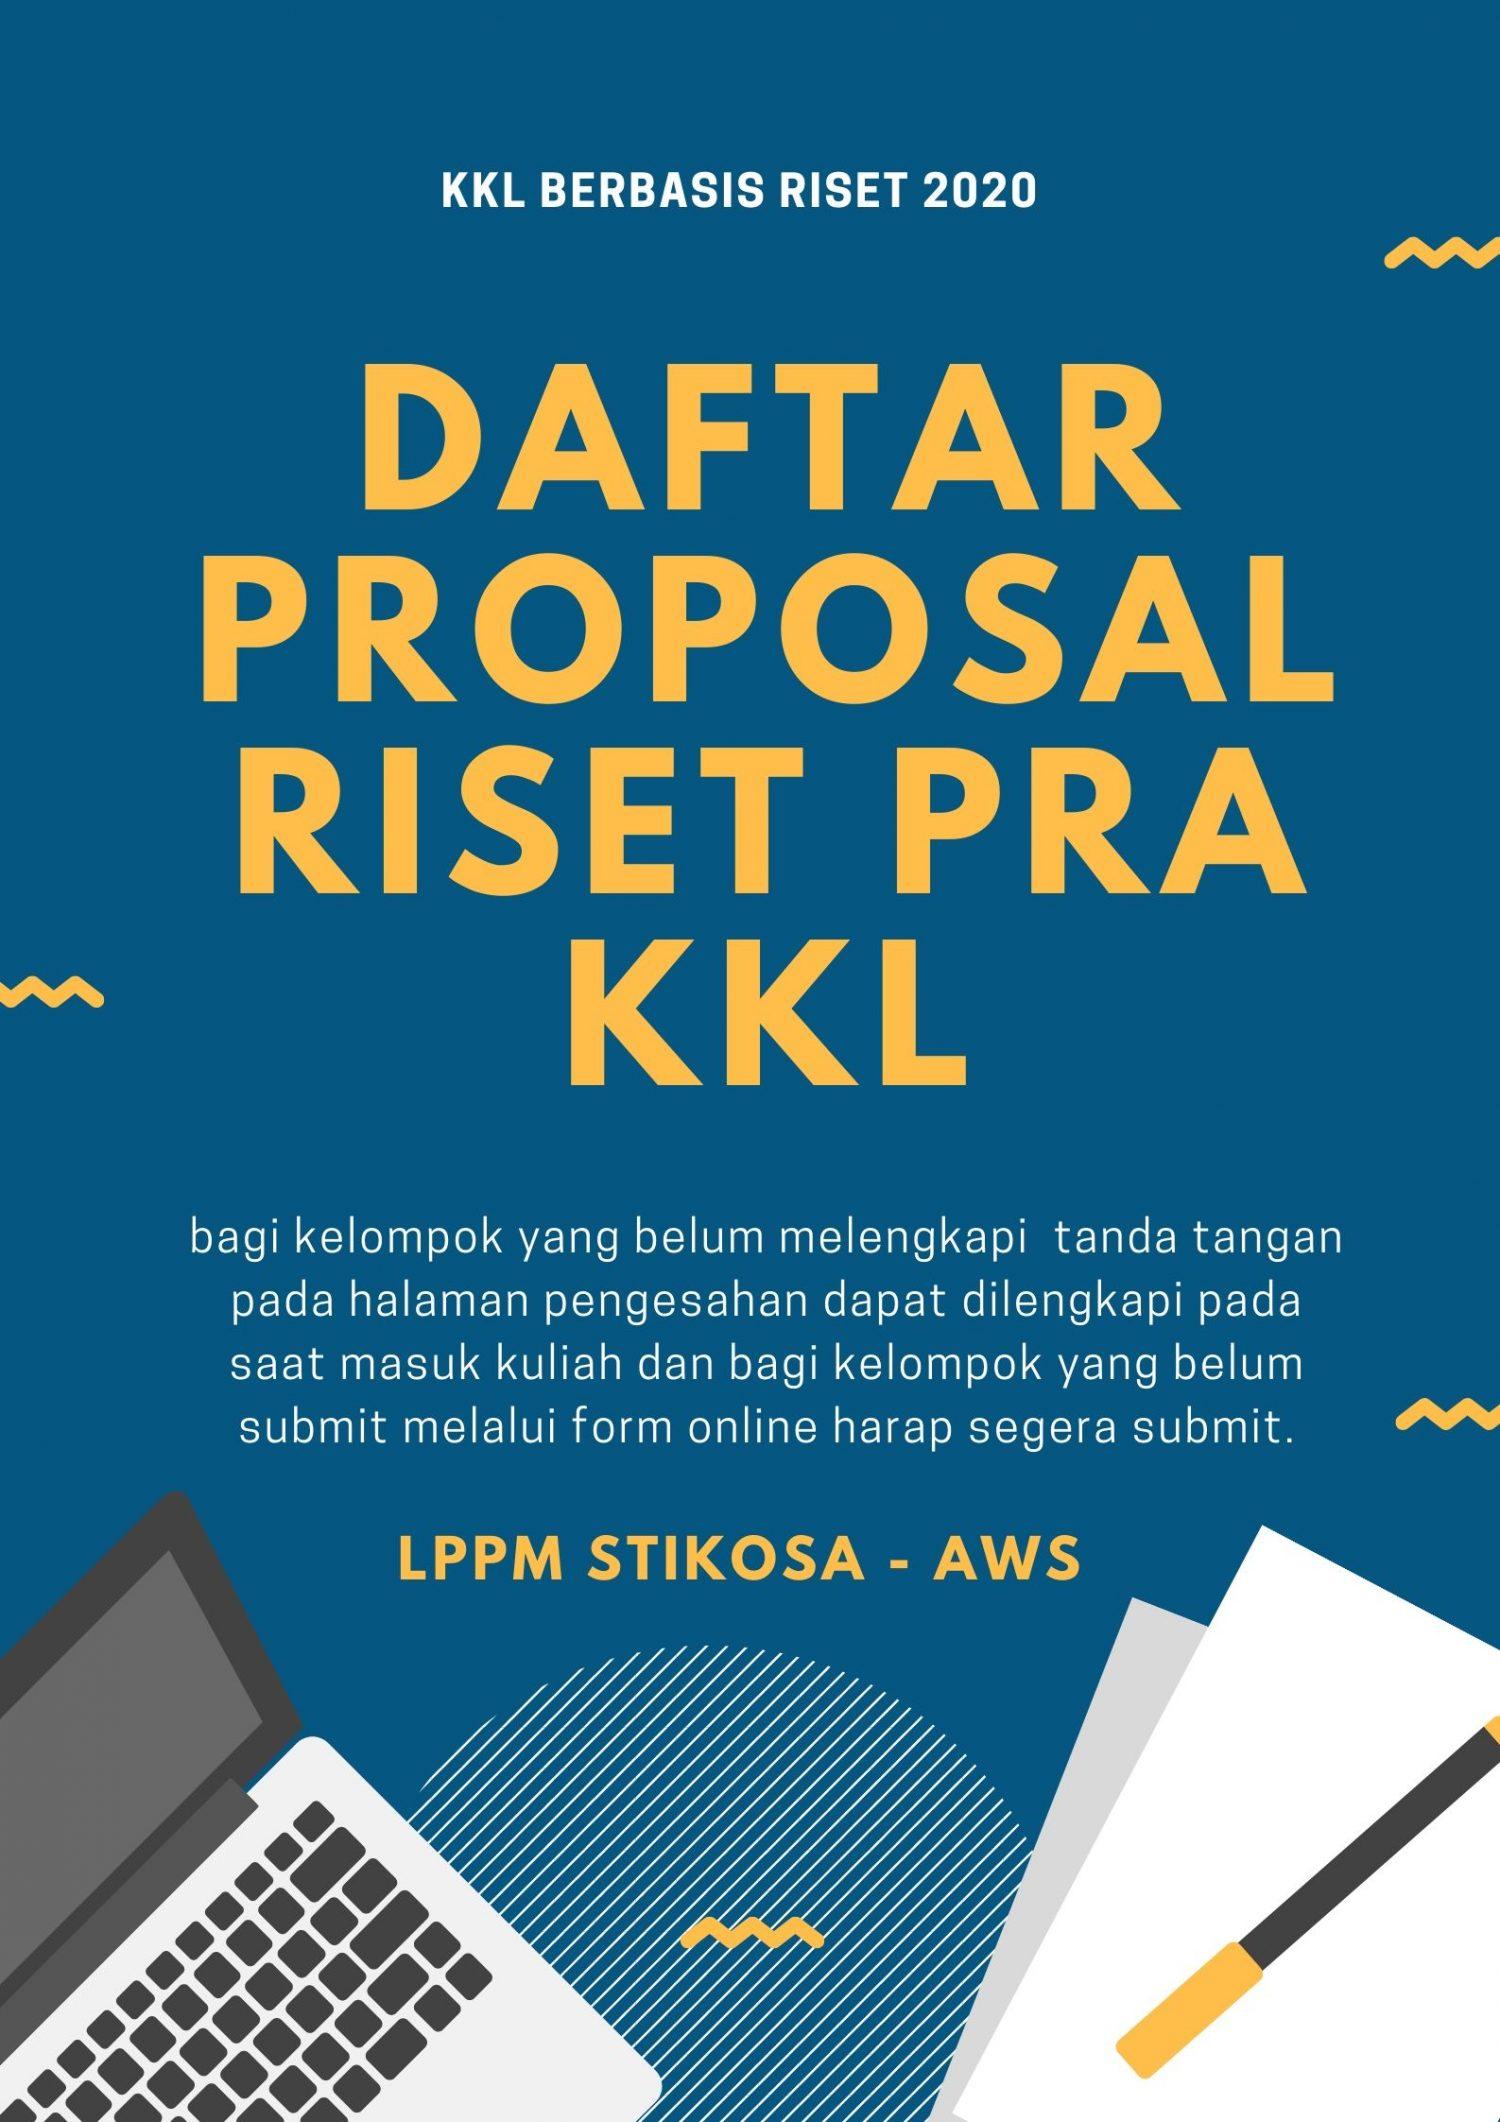 daftar proposal riset pra kkl